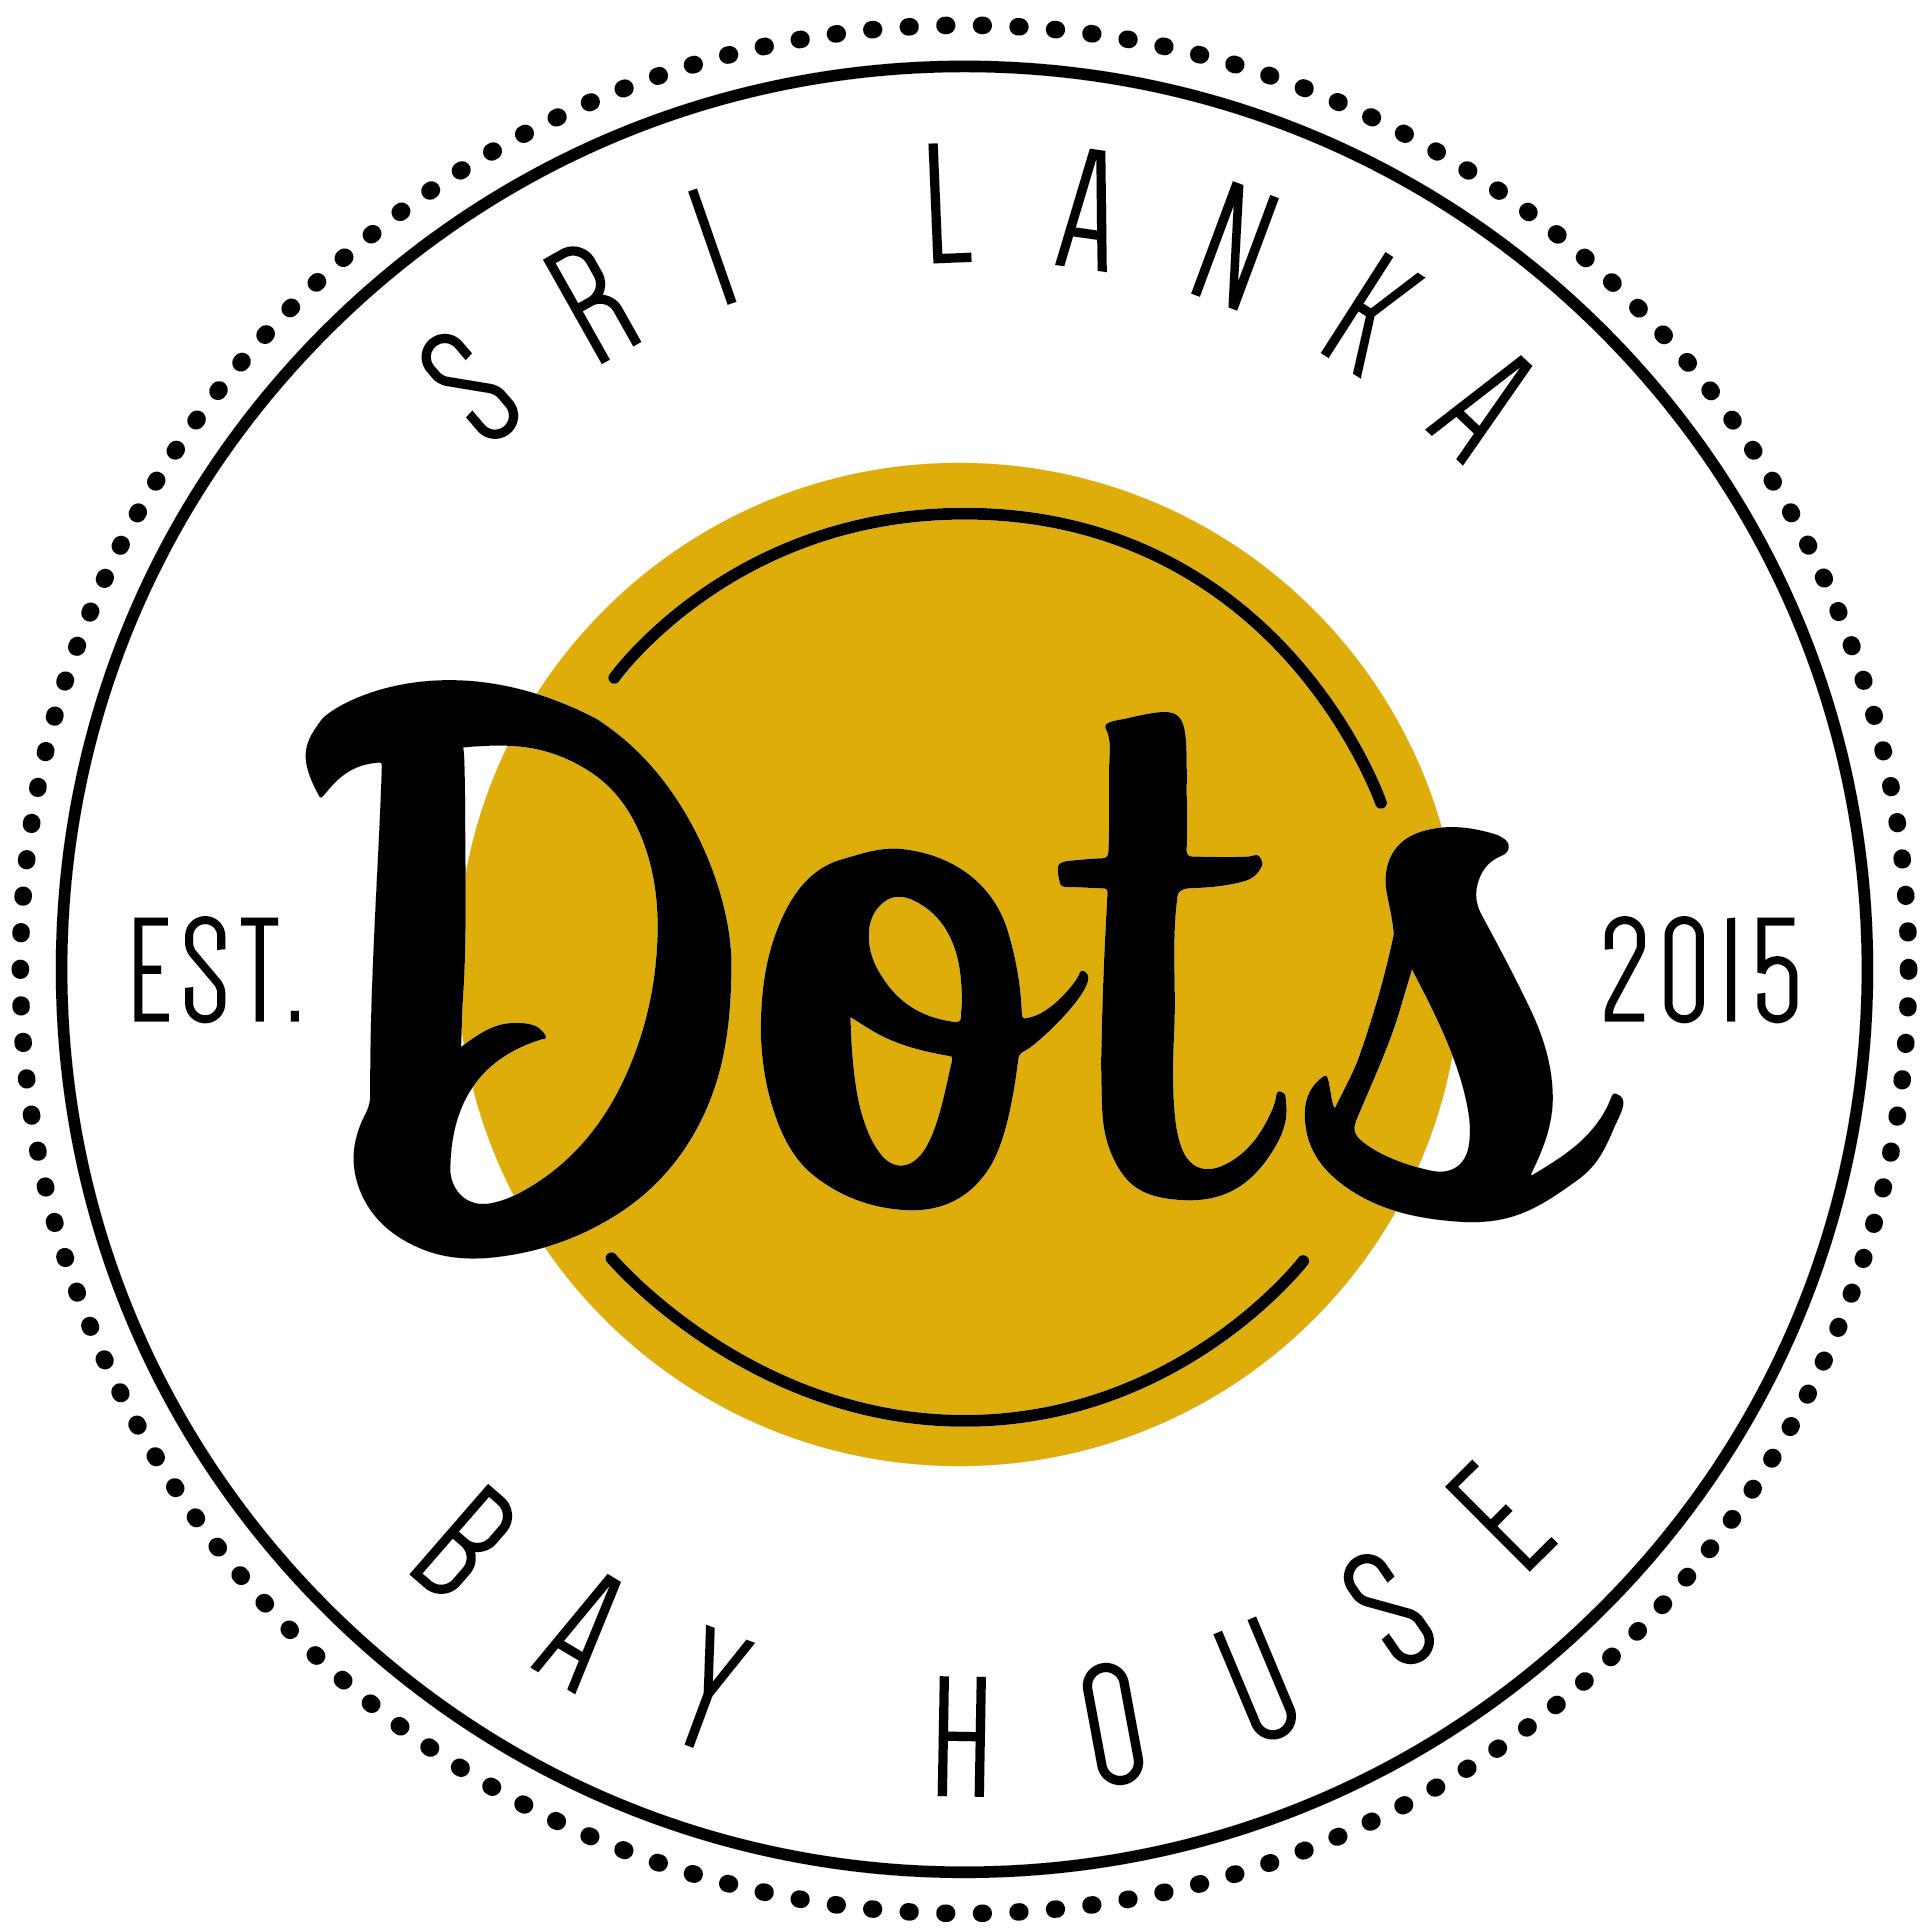 Dots Bay House